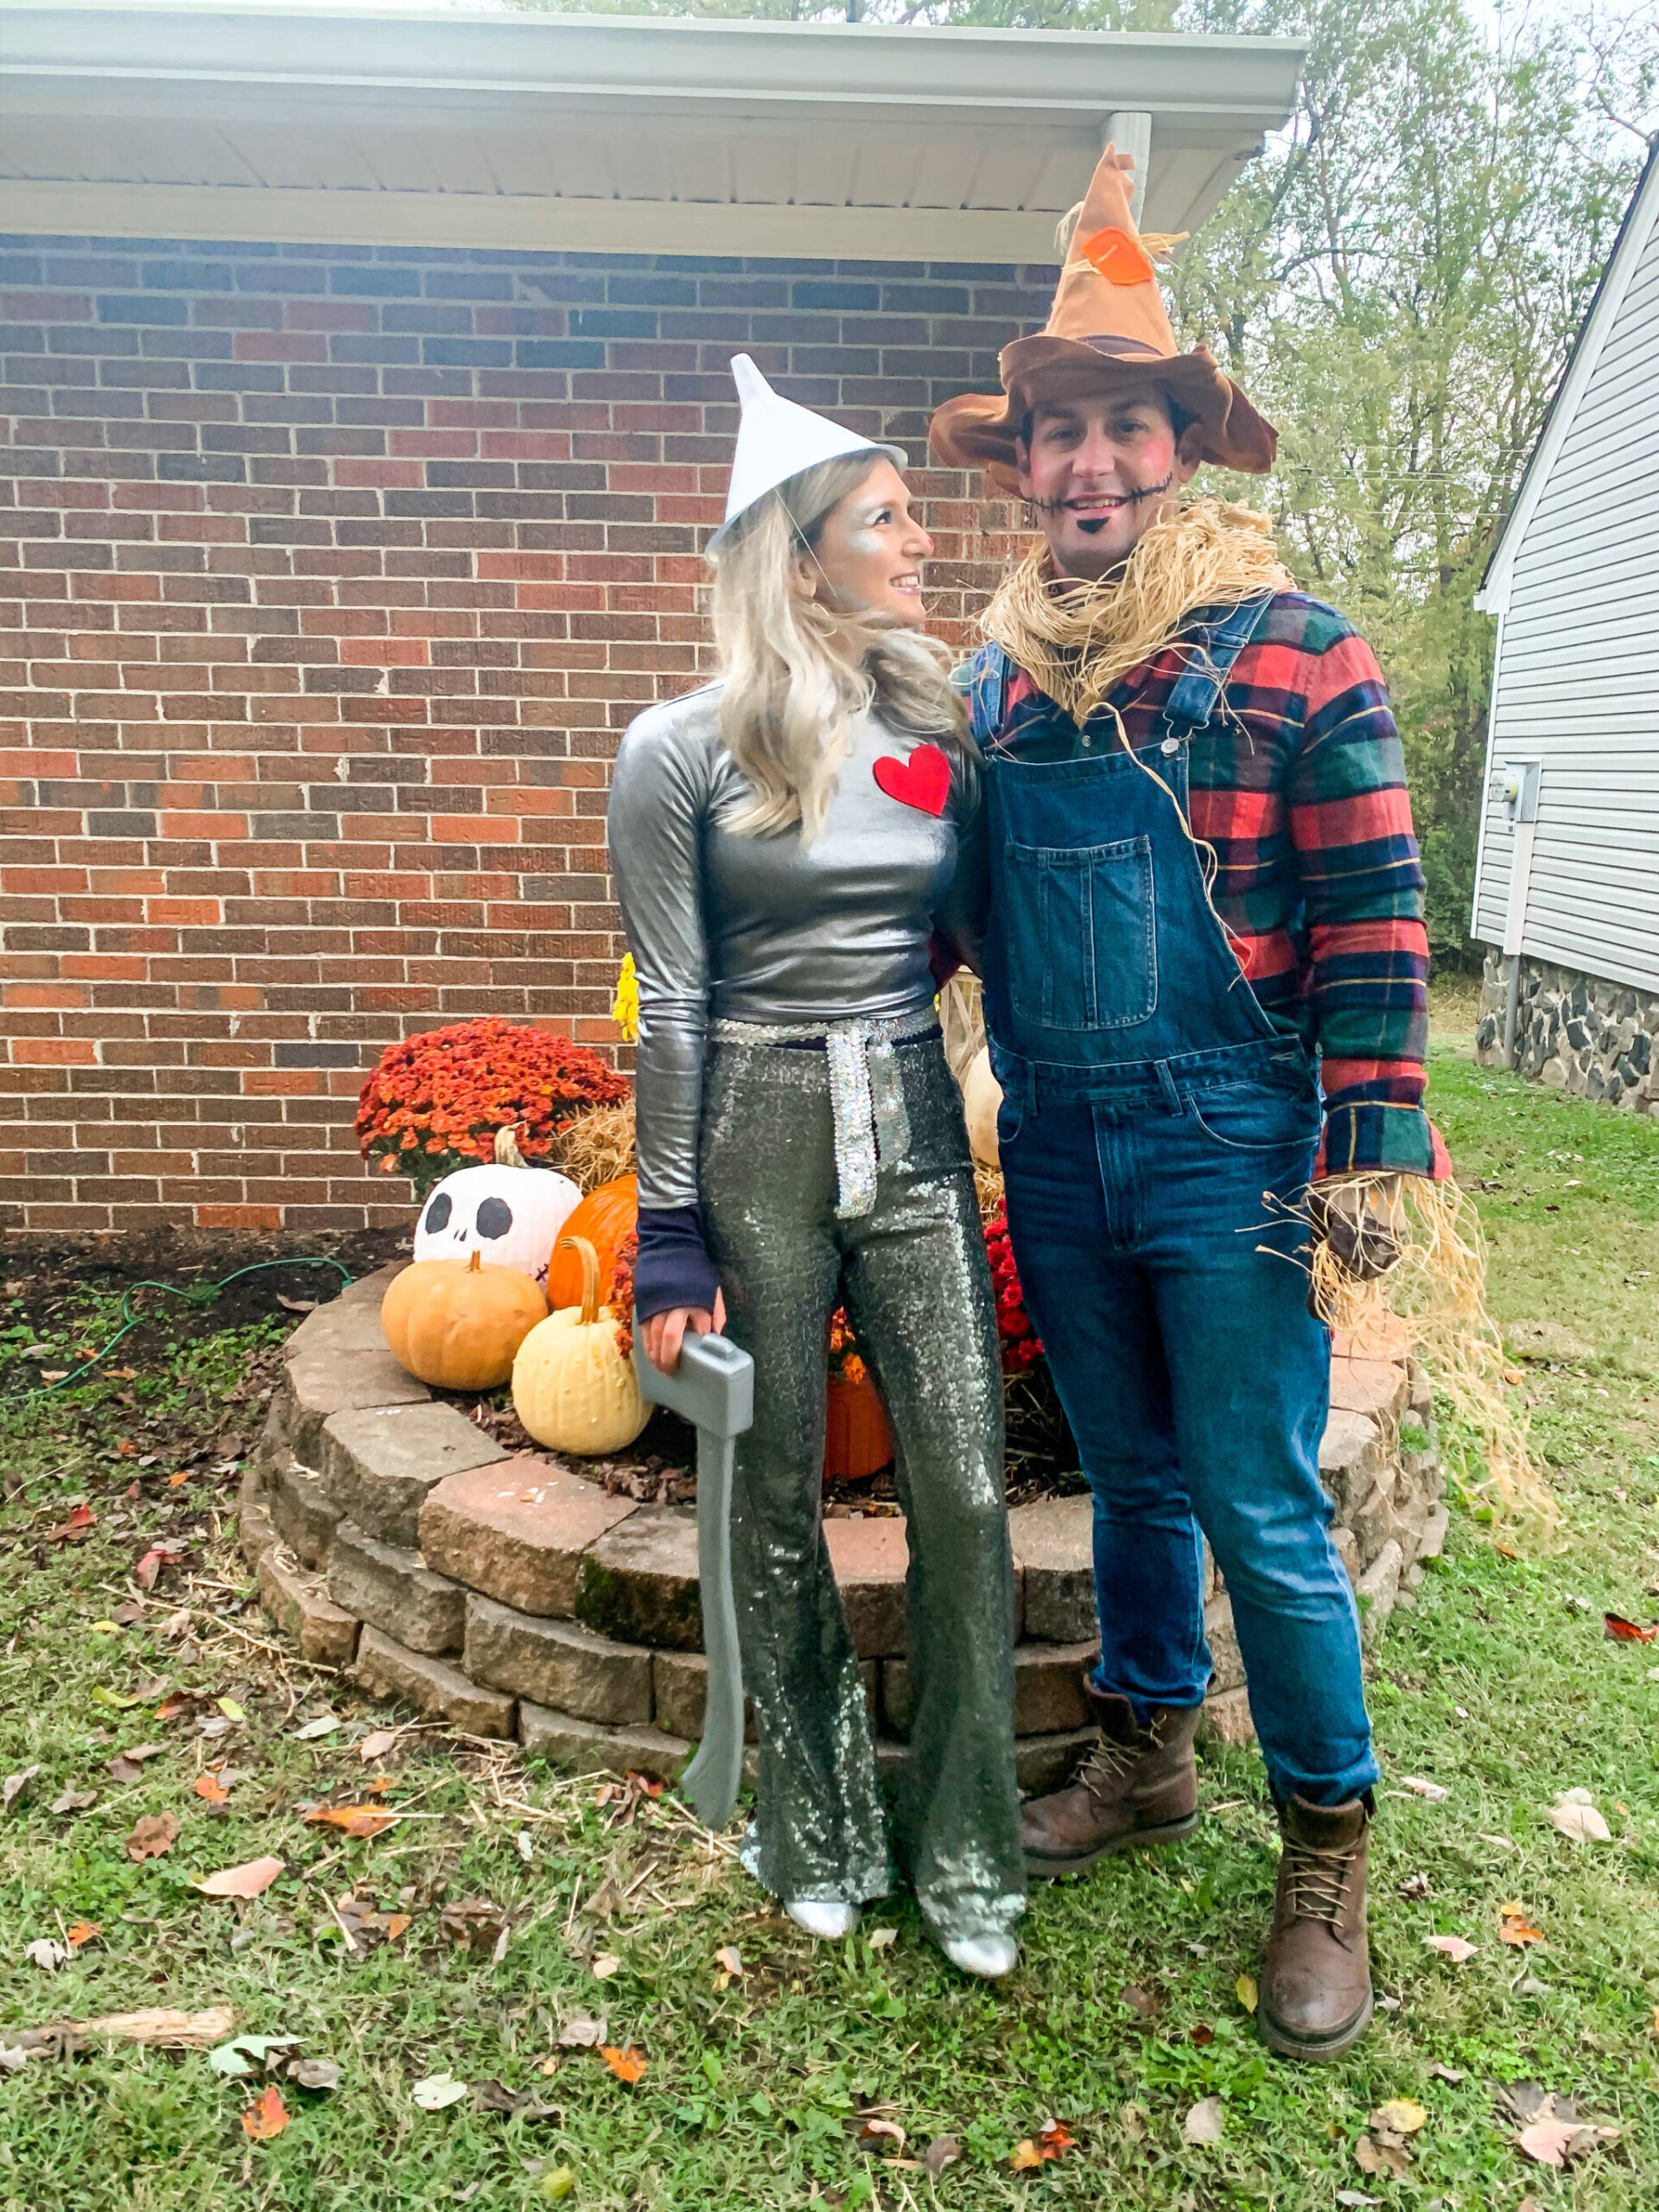 Doctor Office Halloween Costume Ideas from www.annadanigelis.com